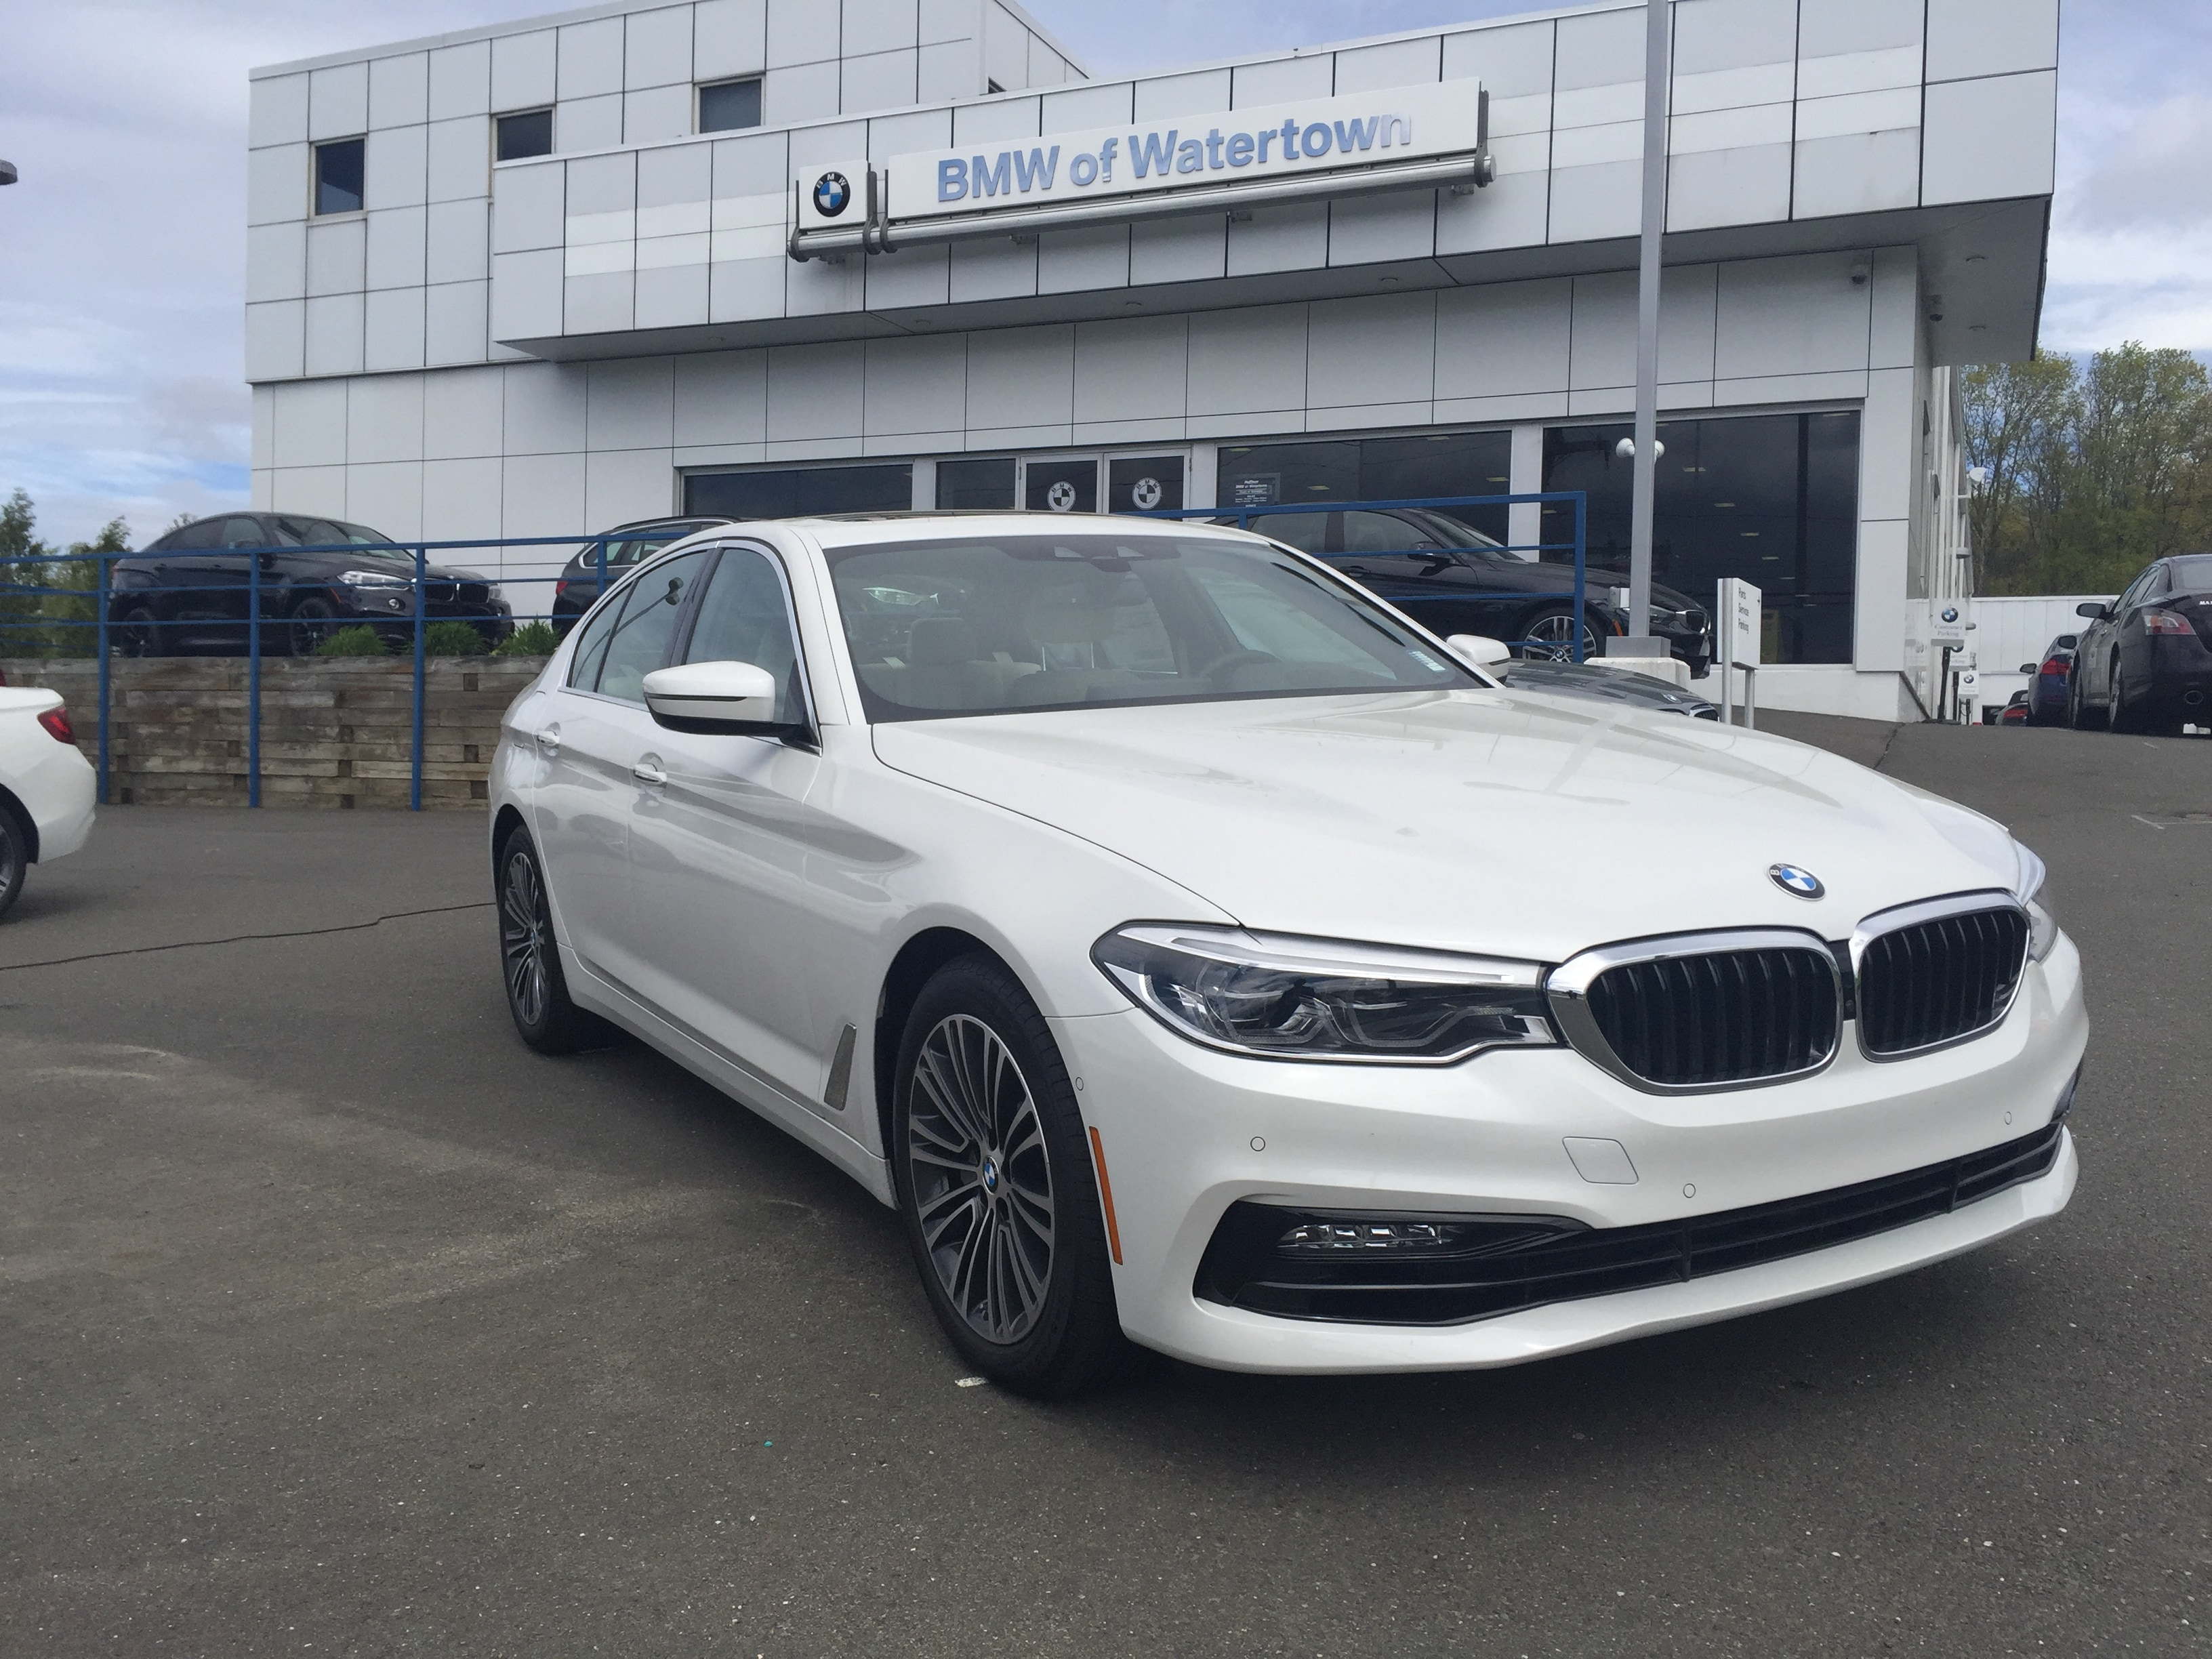 New 2019 BMW 540i xDrive Sedan in Watertown CT